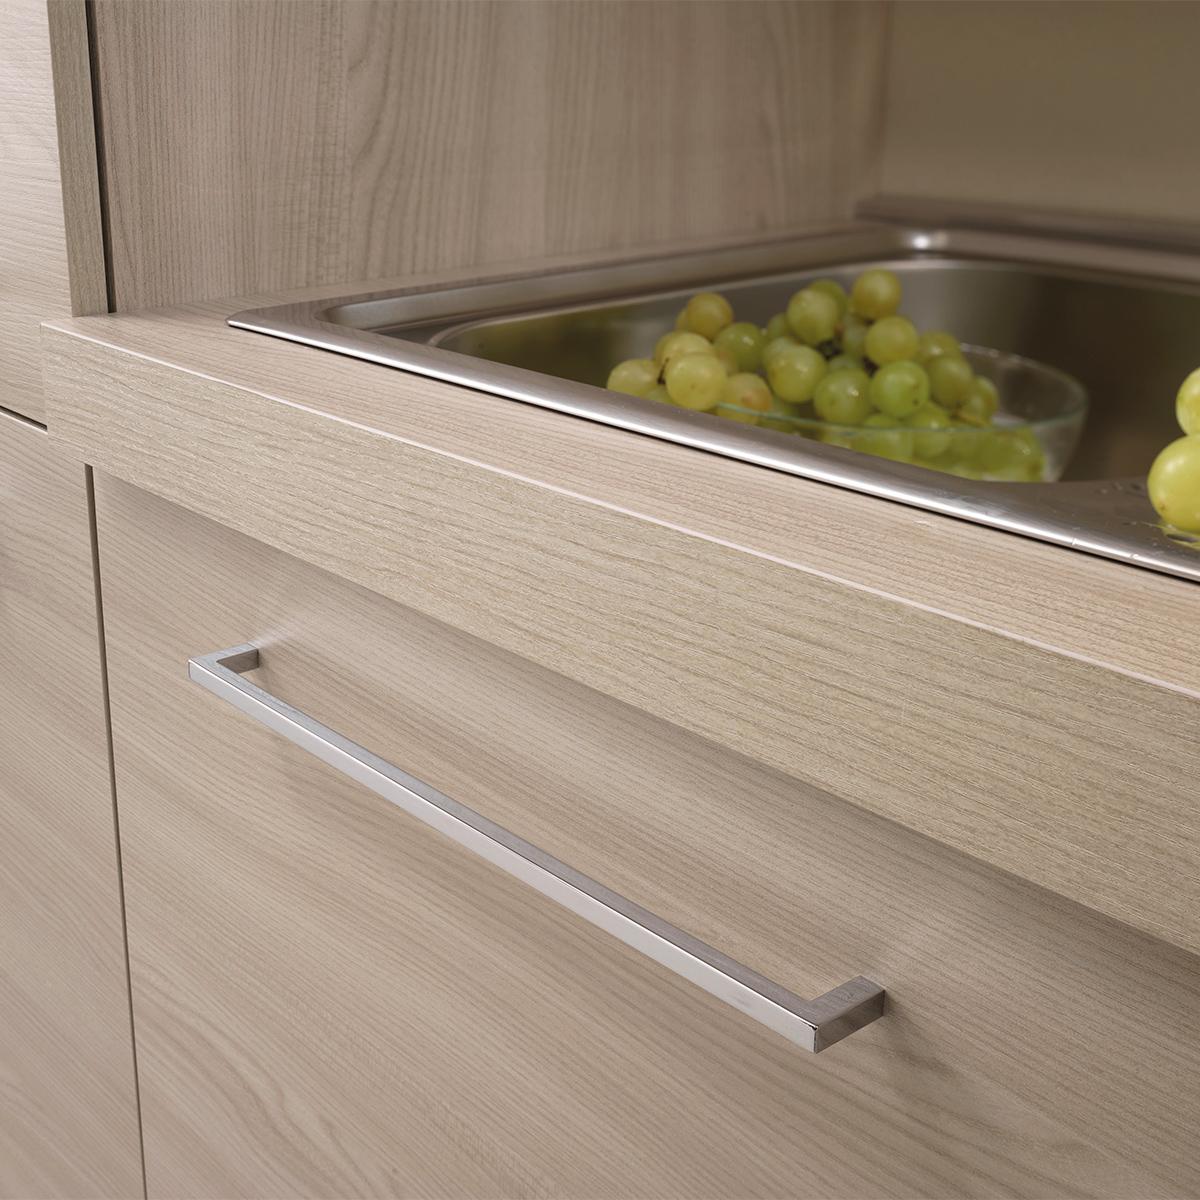 Cucina componibile bianco ginevra ep0a for Landini cucine ginevra